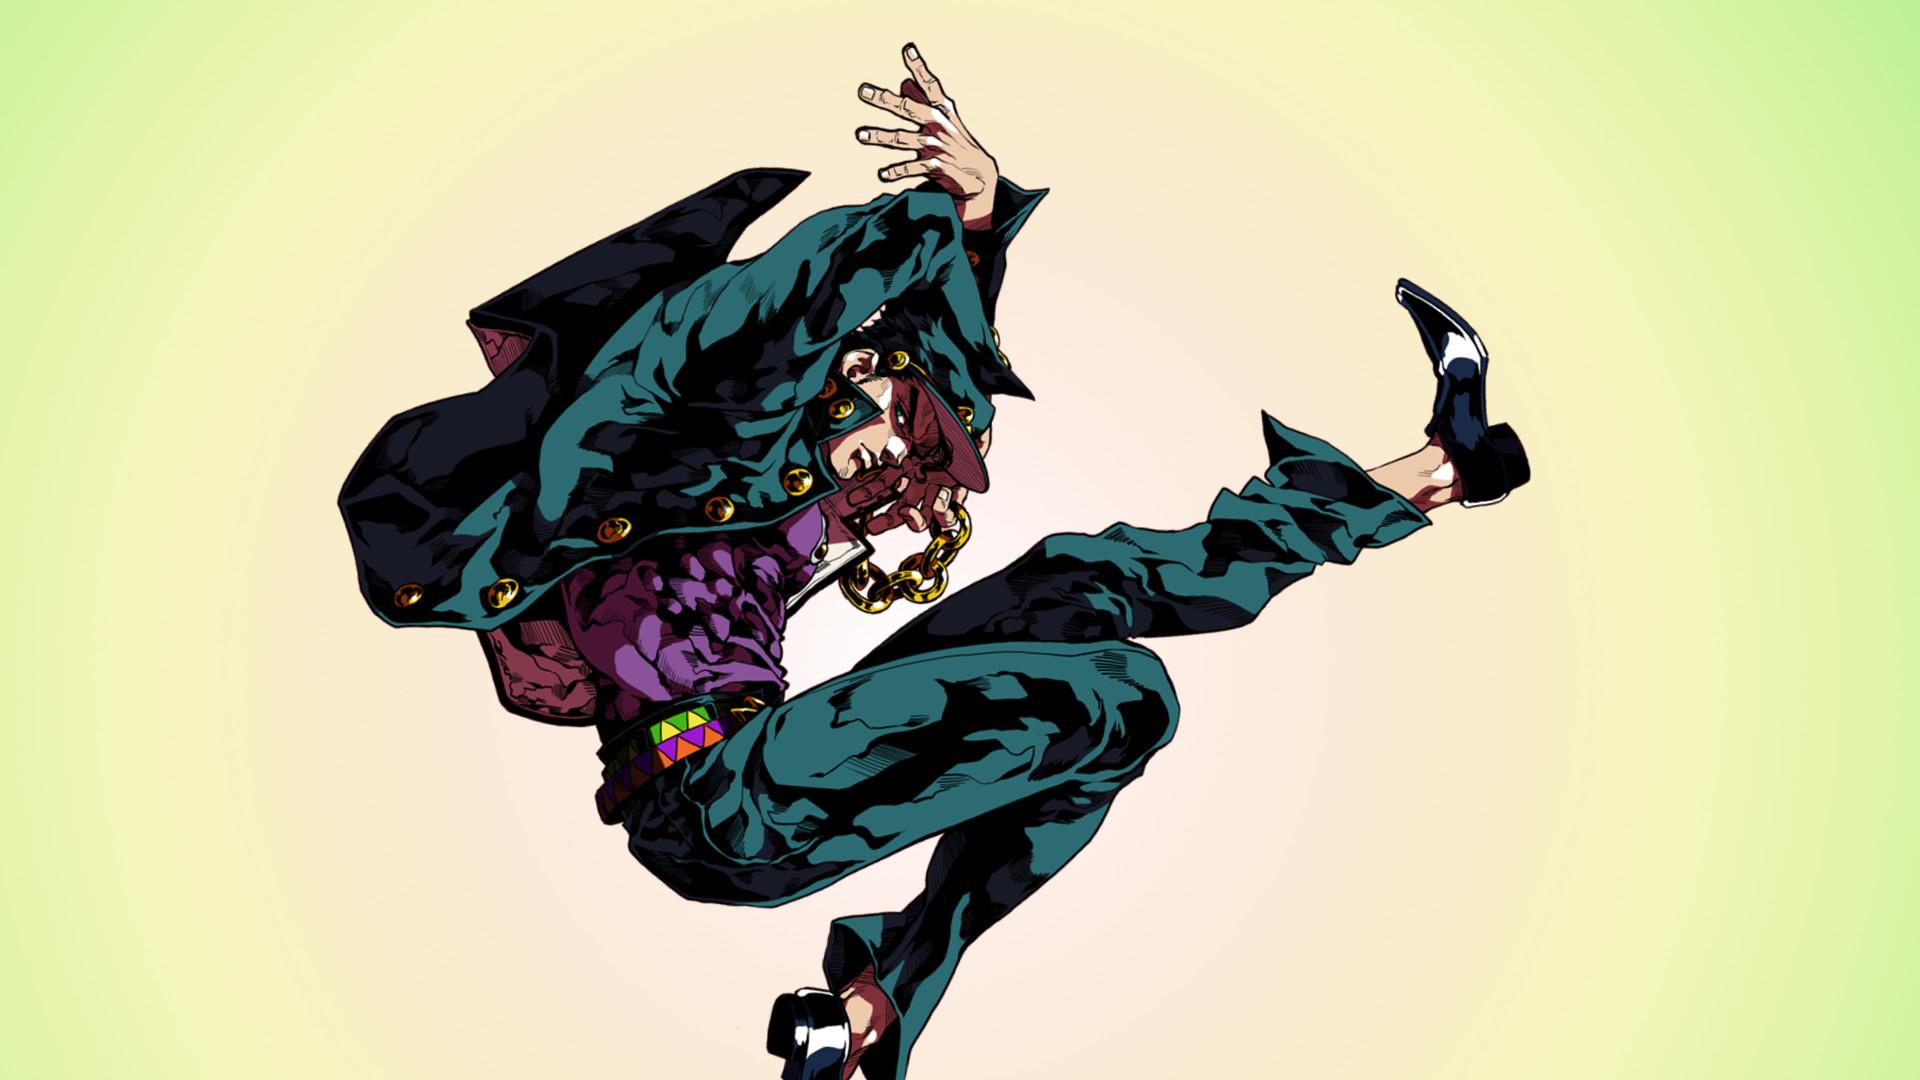 Anime anime JoJo's Bizarre Adventure Jotaro Kujo dancing .